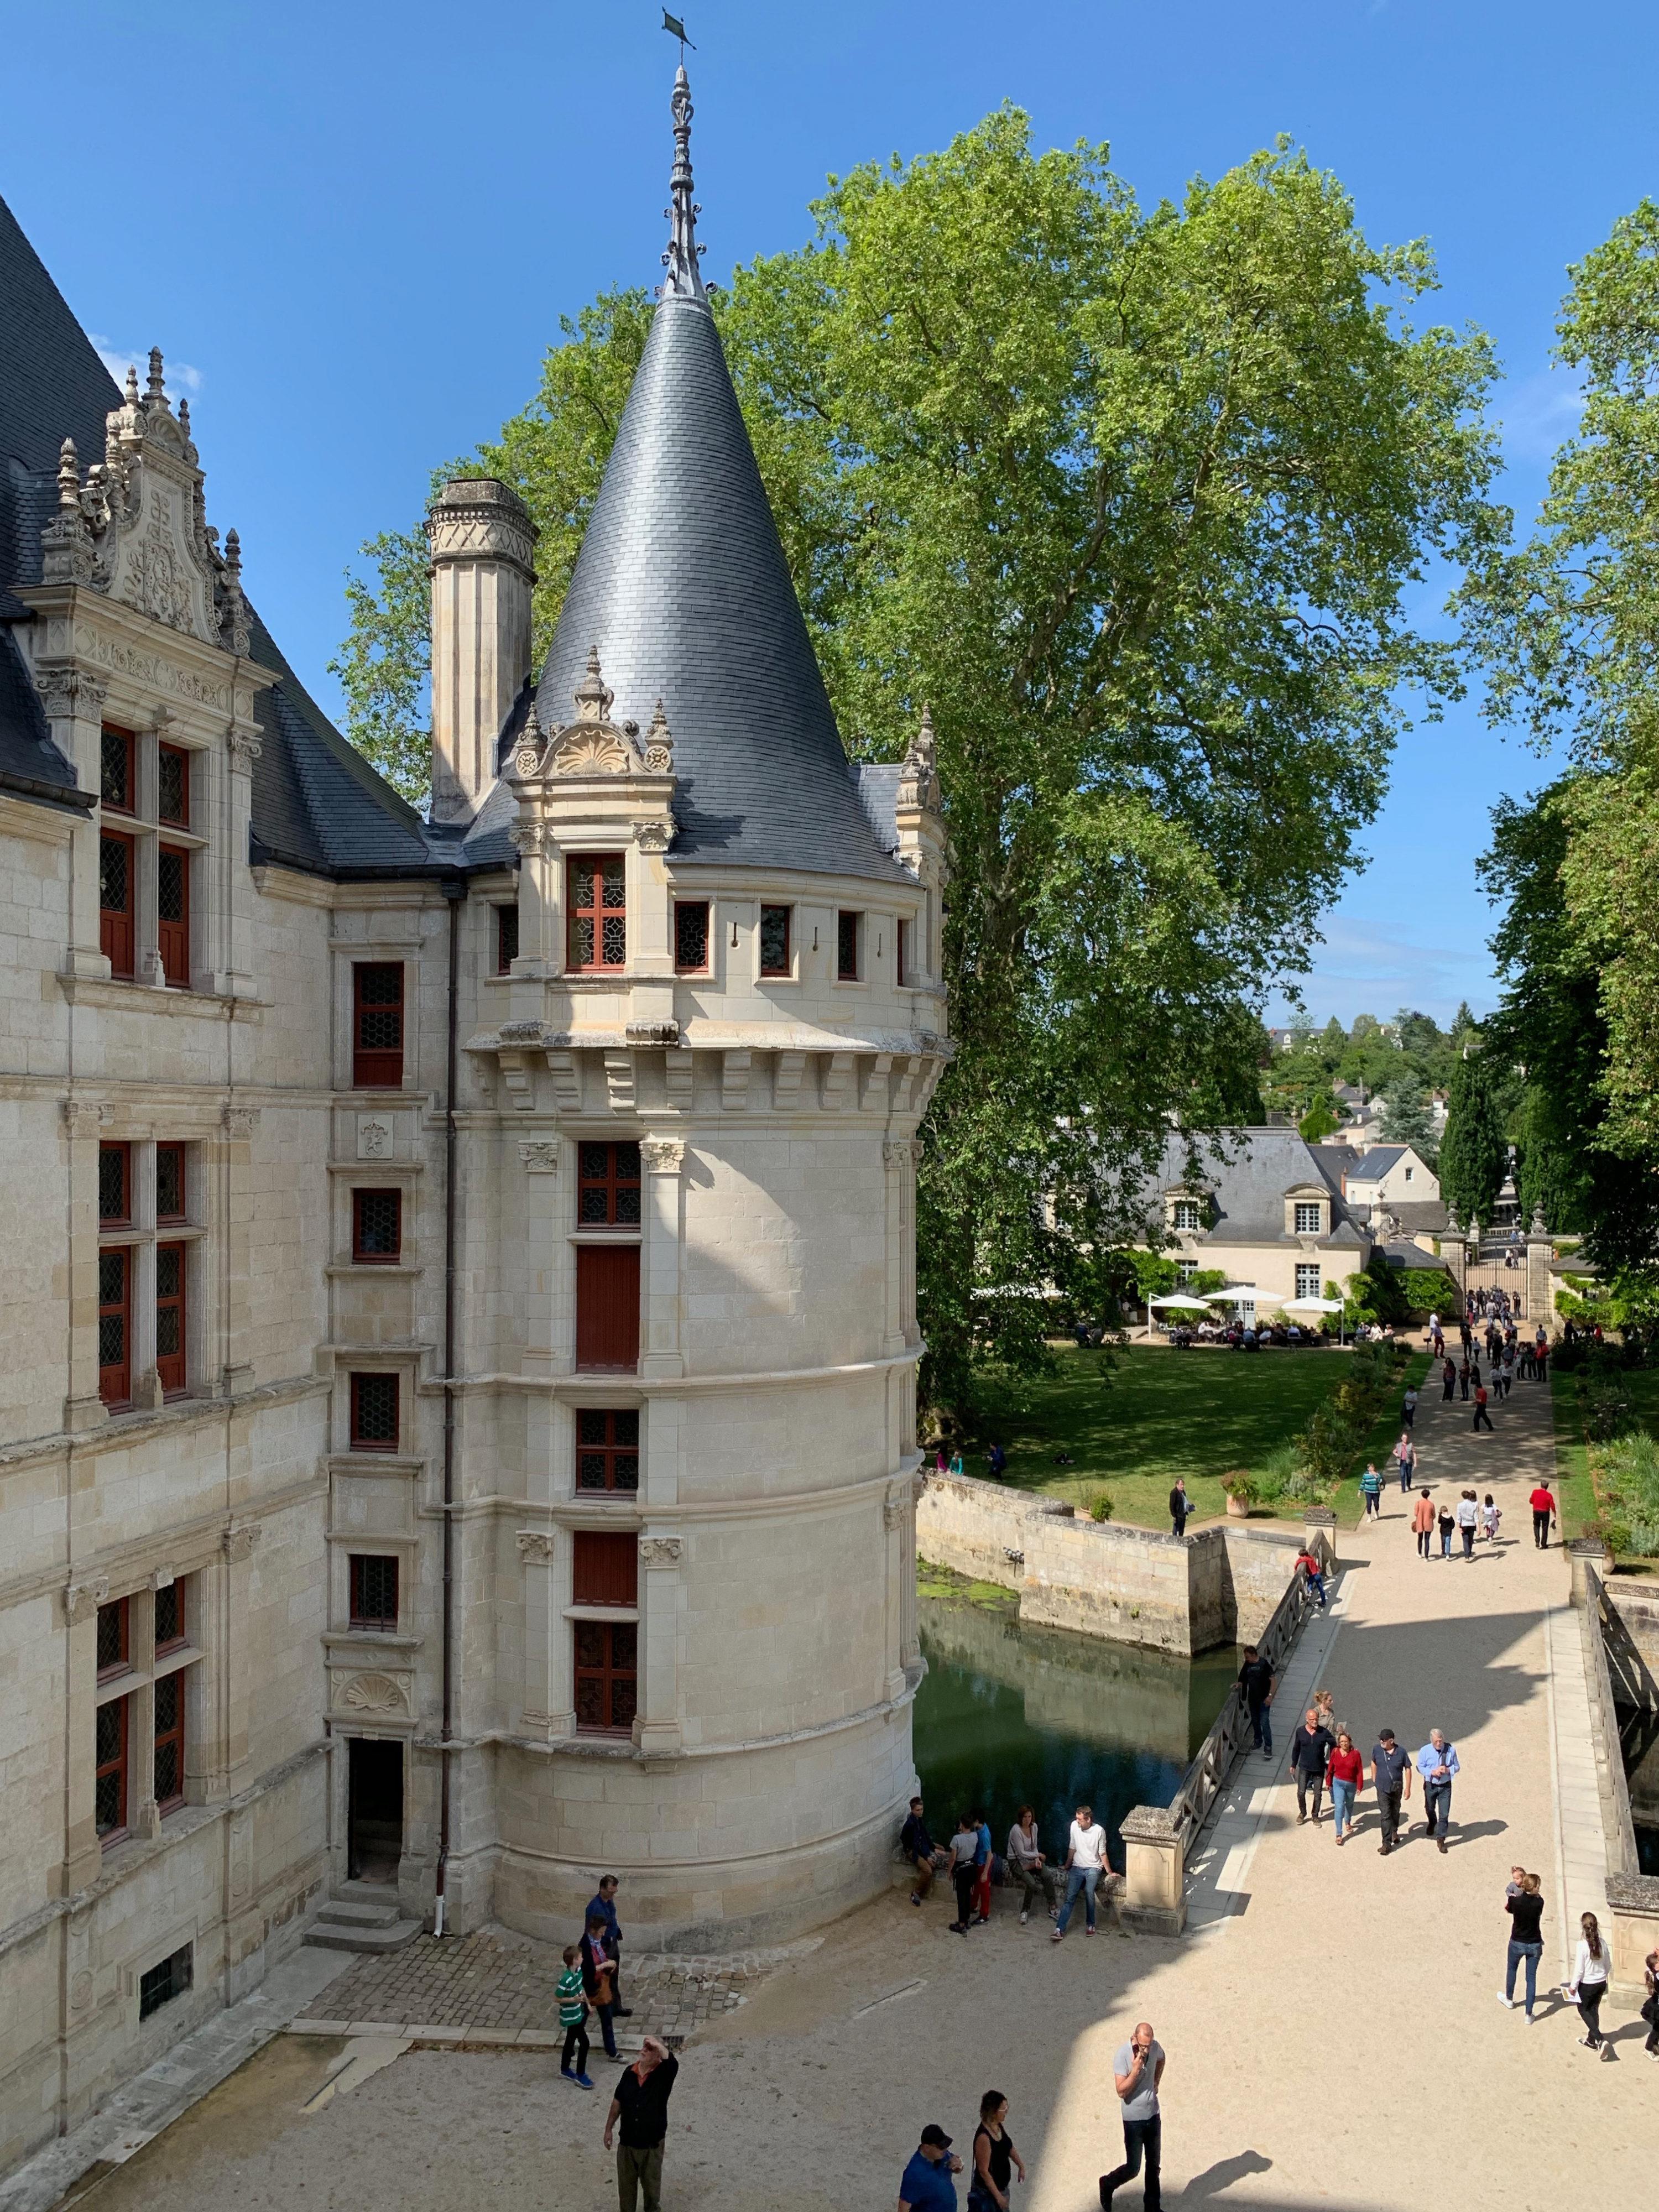 Azay-le-Rideau, das vom Indre umflossene Renaissance-Schloss Eckturm